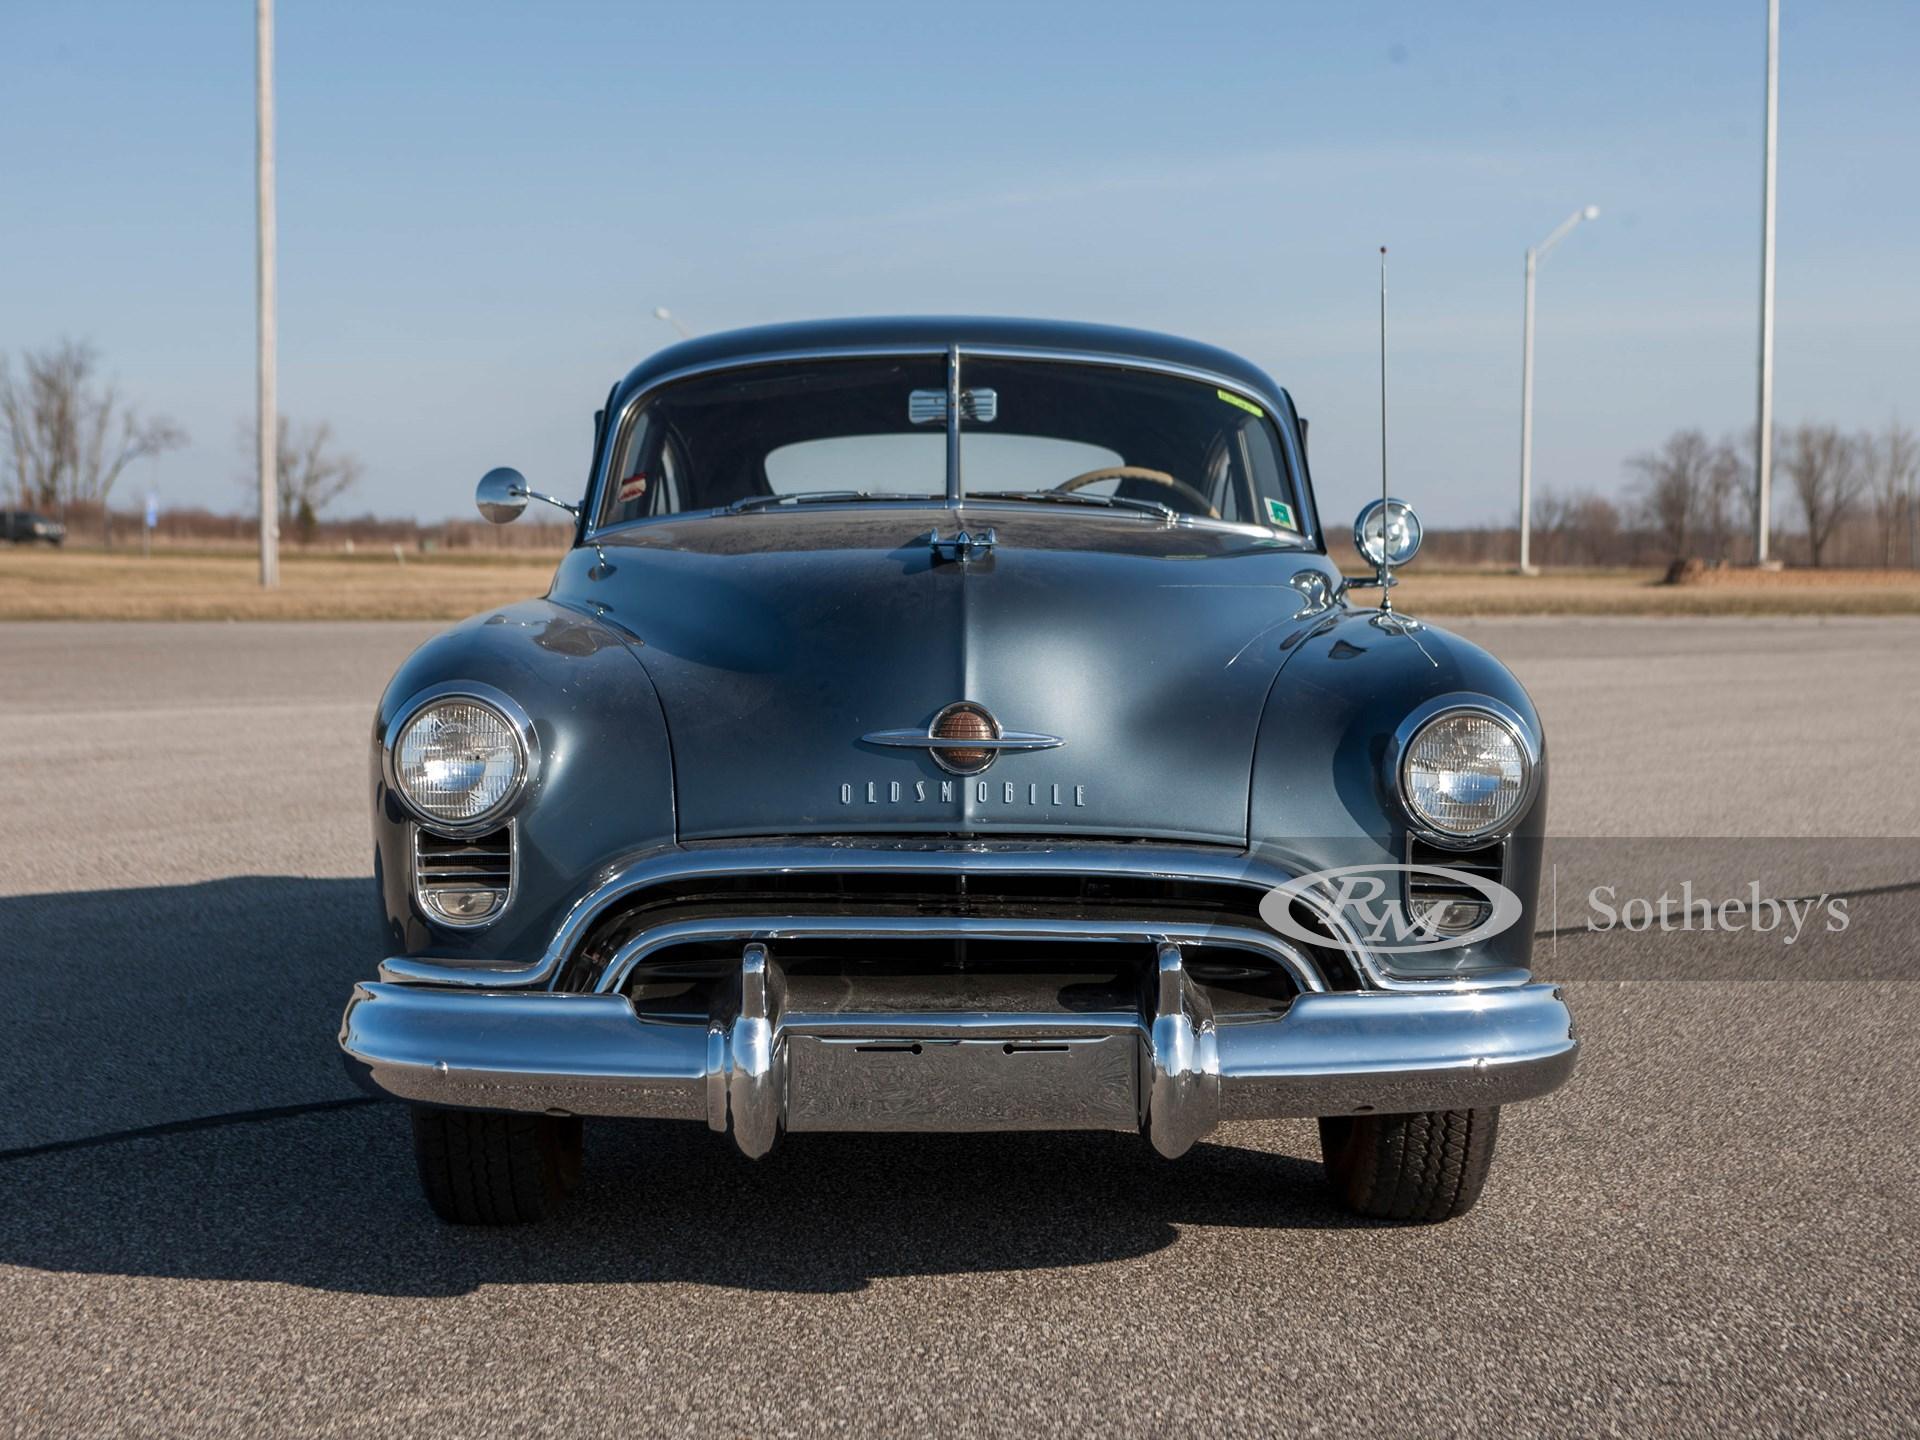 1949 Oldsmobile 98 Futuramic Sedanette  -